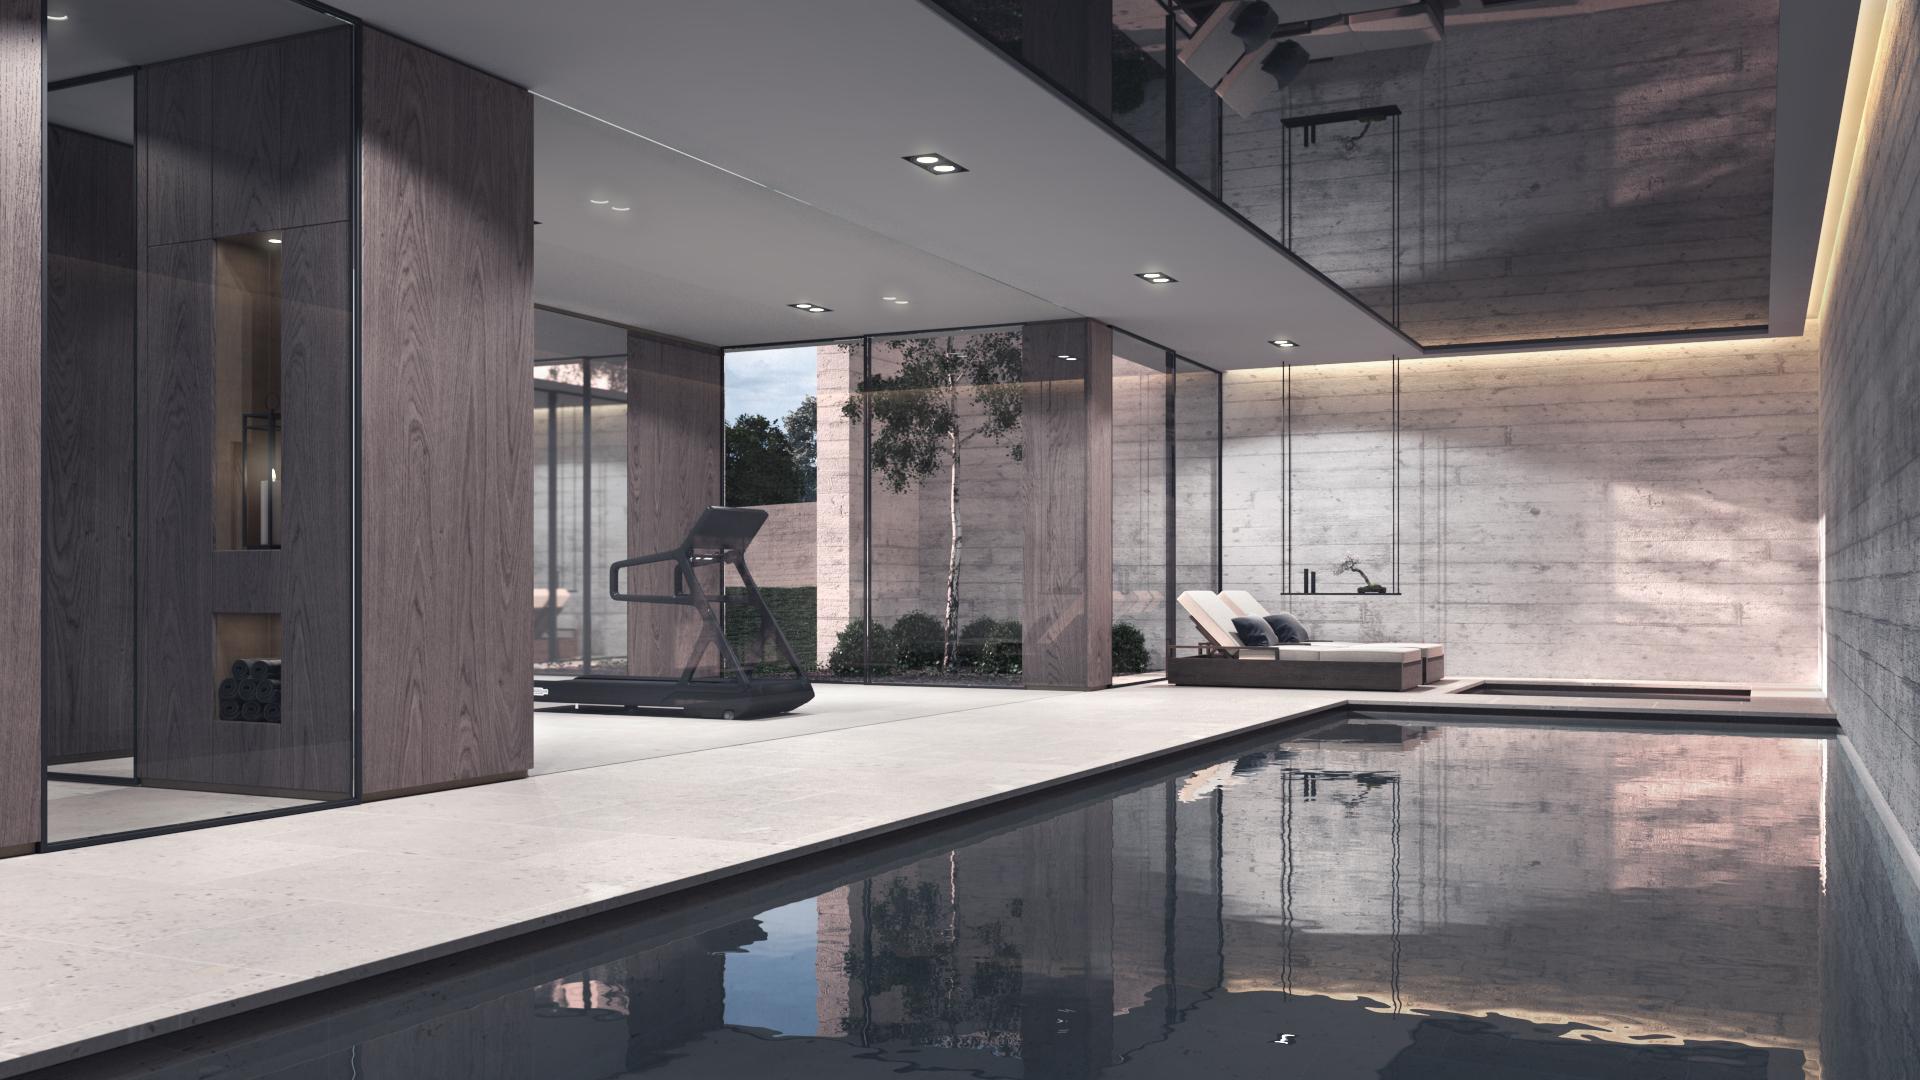 Top Interiorista: Belén Domercq una referencia en diseño de interior top interiorista Top Interiorista: Belén Domecq una referencia en diseño de interior piscina